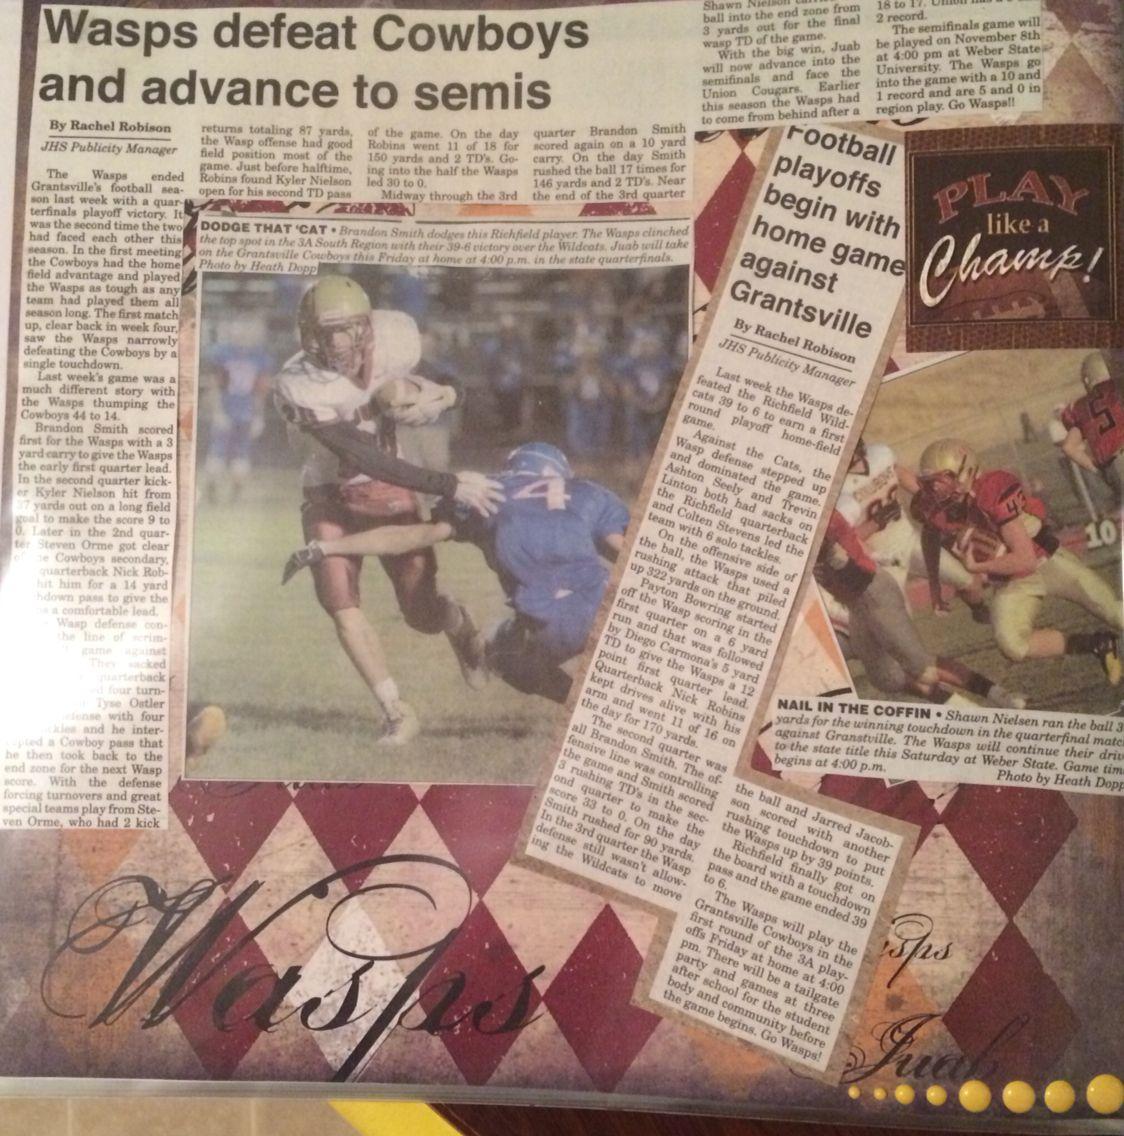 How to scrapbook newspaper clippings - Scrapbook Ideas University Sports Scrapbook Scrapbook With Newspaper Clippings Football Scrapbook Layouts